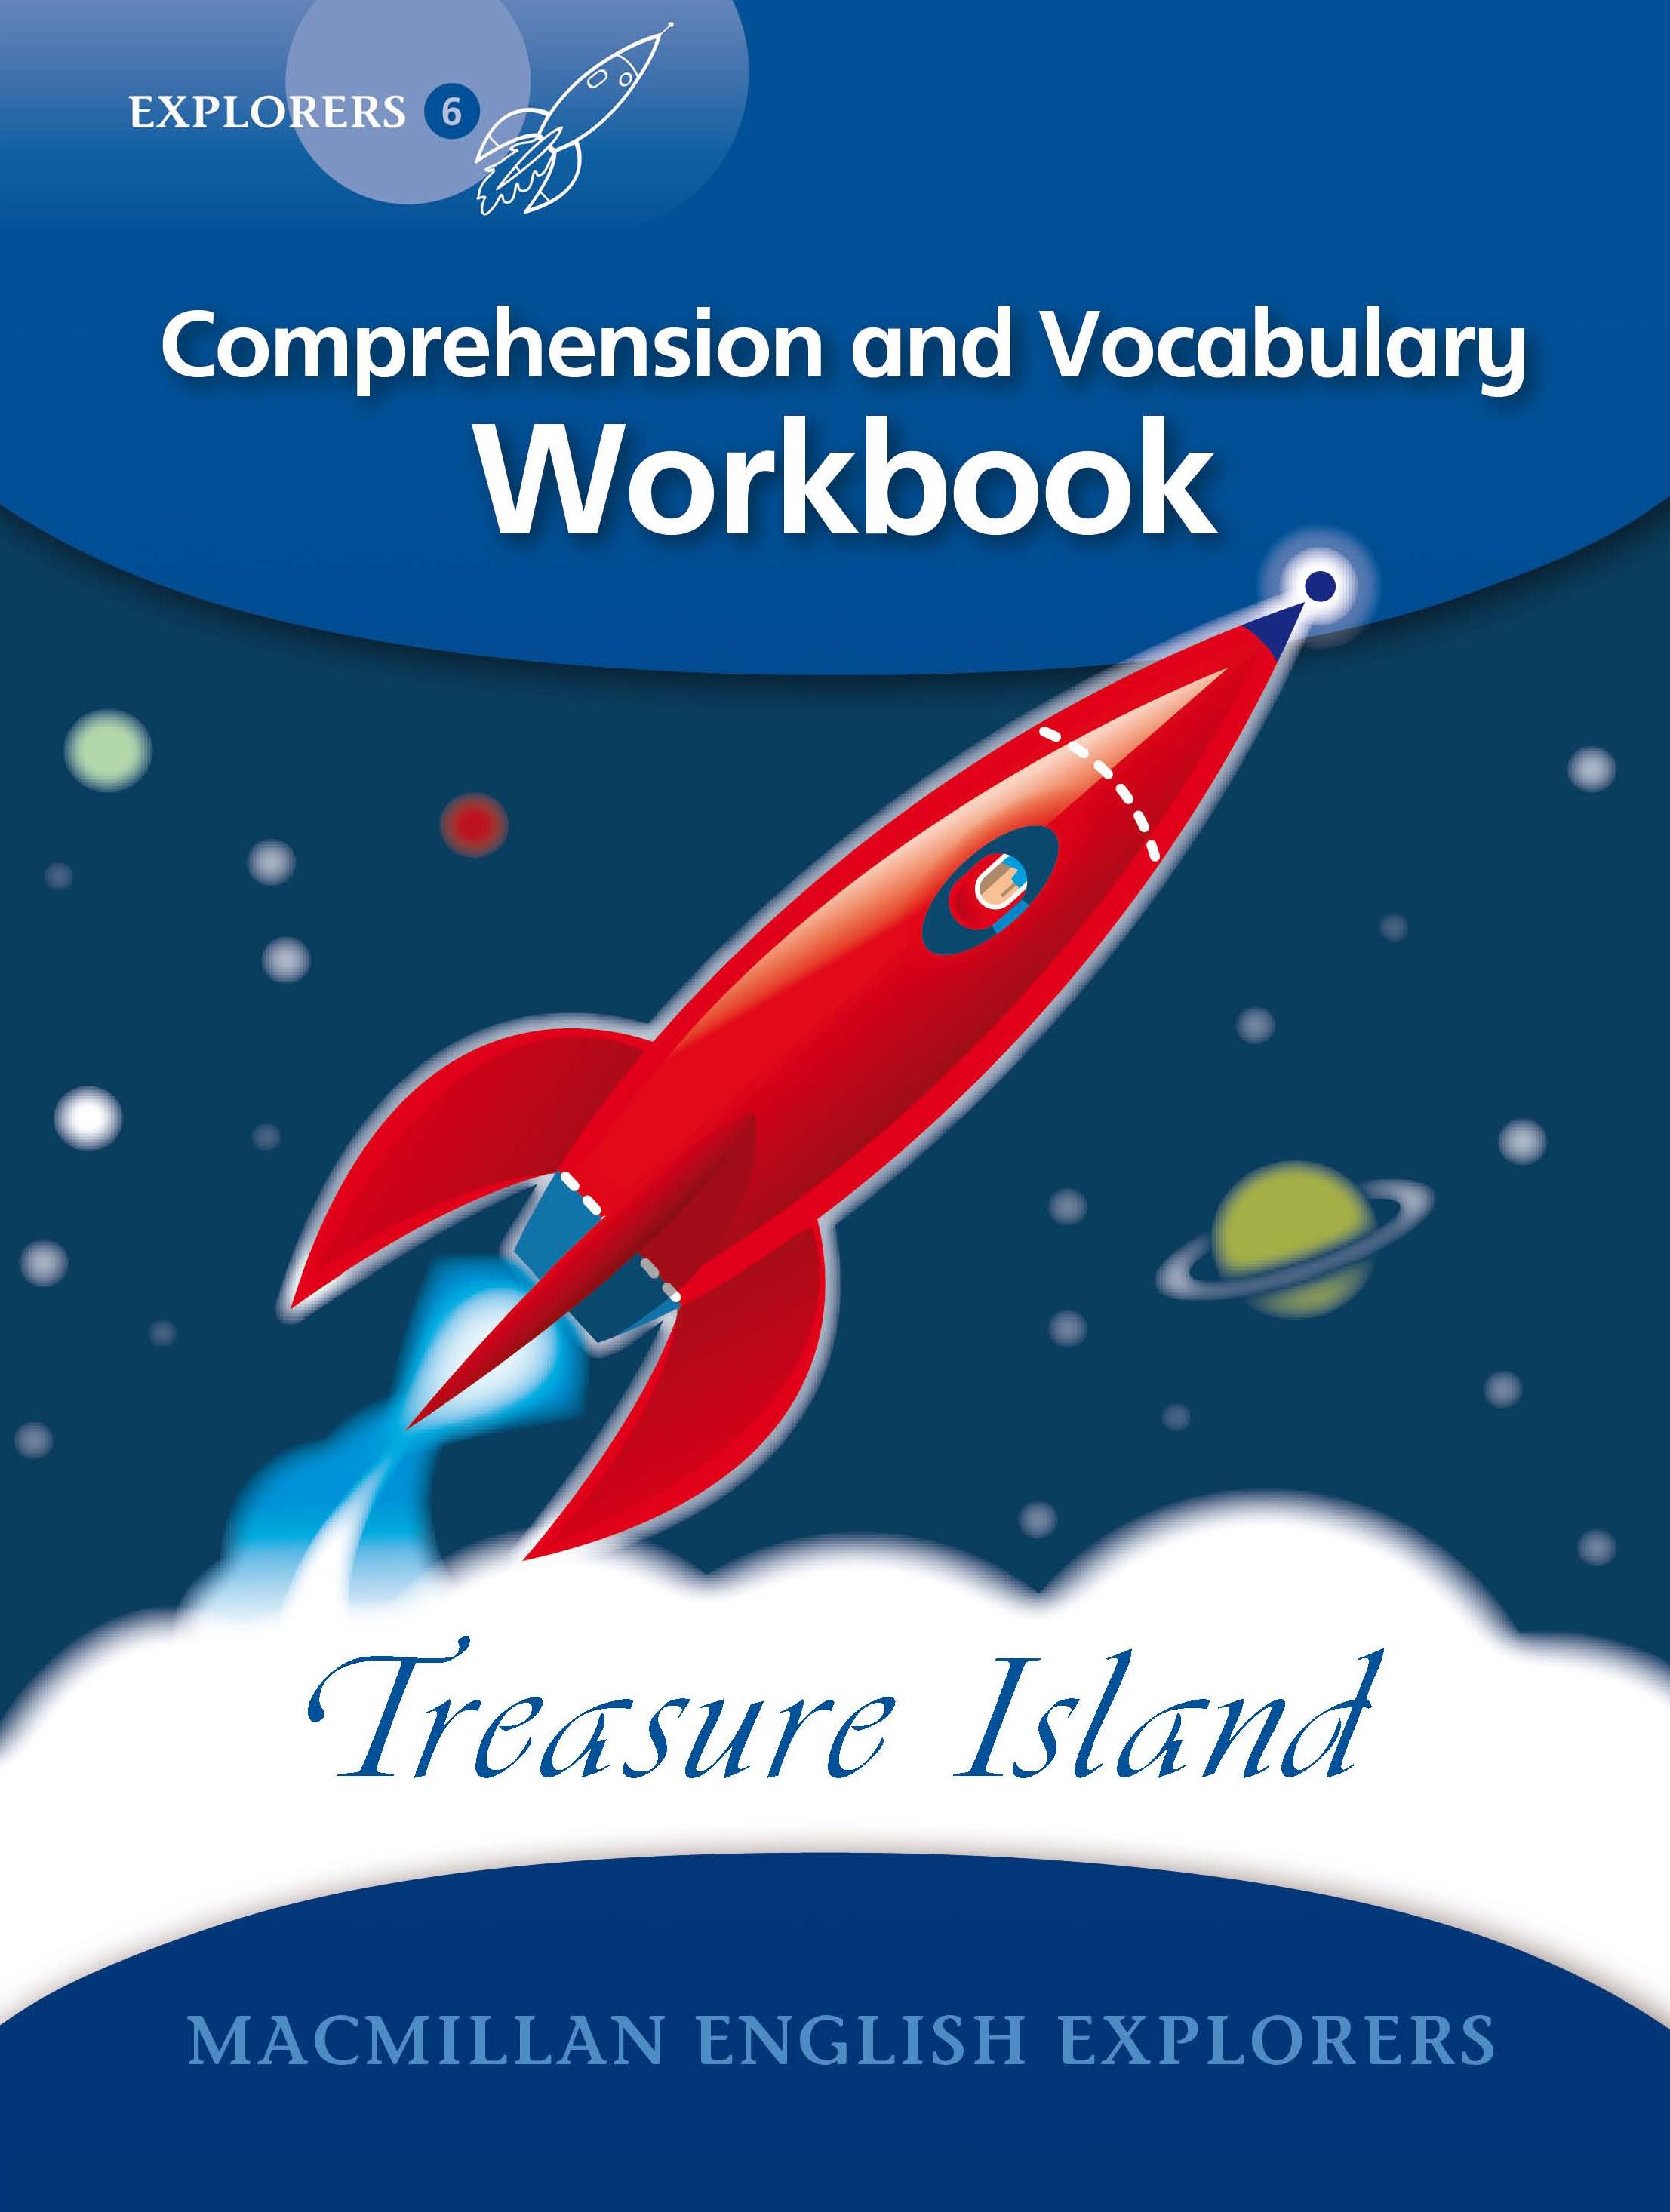 Explorers 6: Treasure Island Workbook